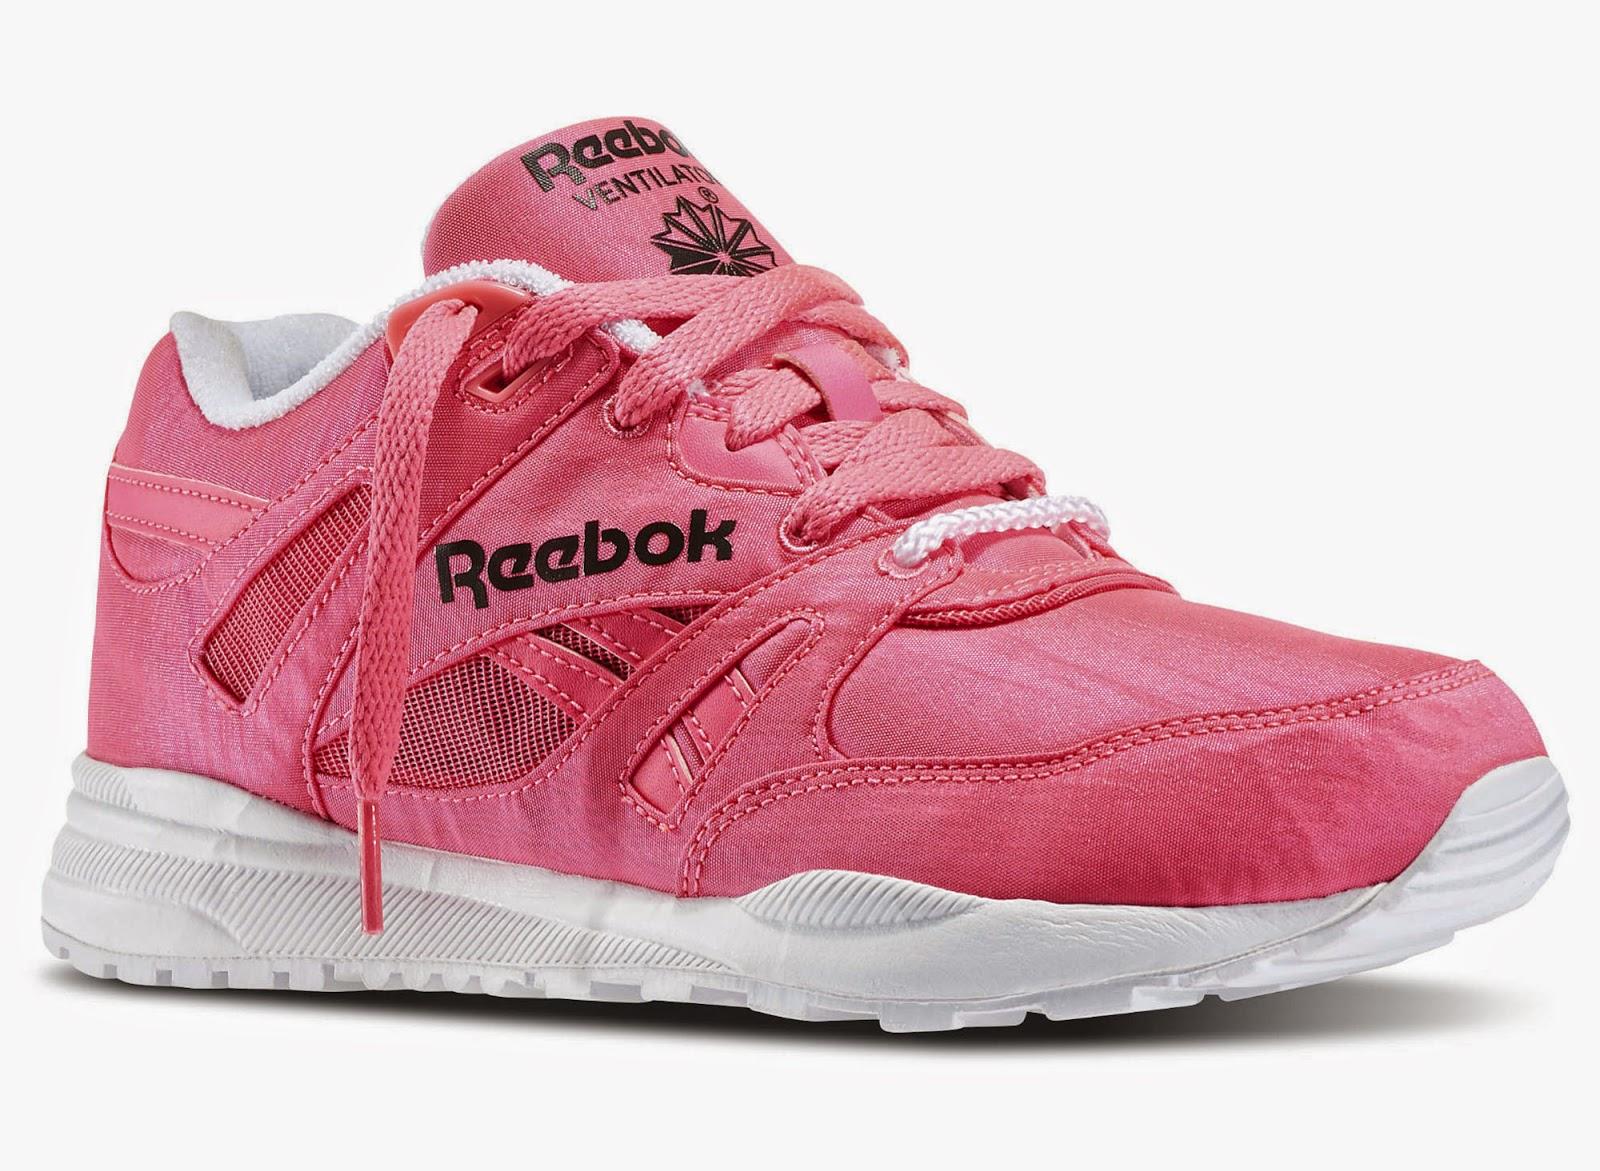 zapatillas reebok mujer para caminar